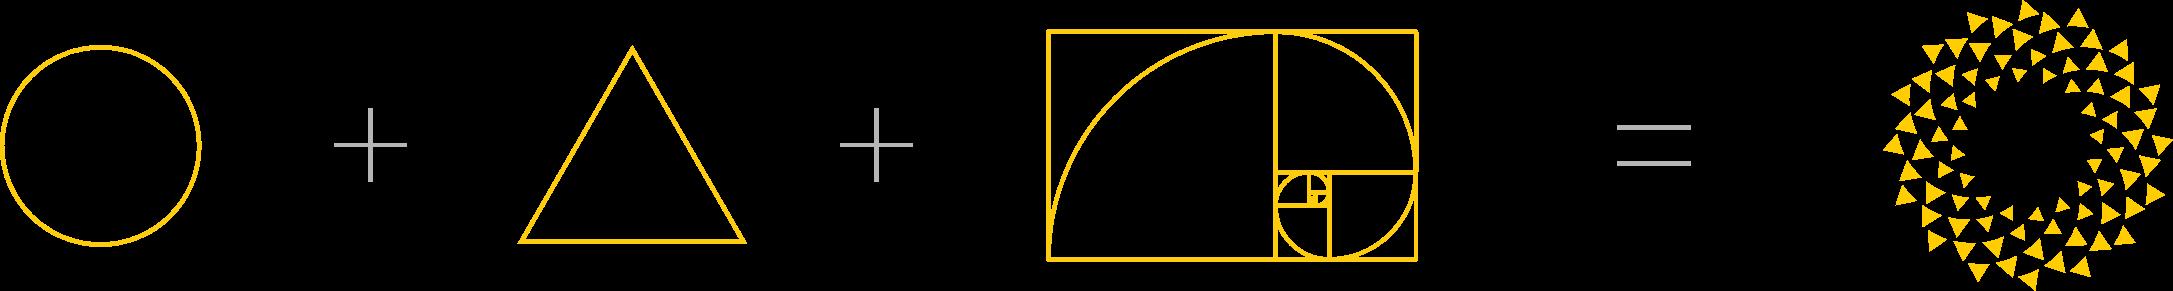 Creative Caterpillar client Nelson Mandela University Investment Company Golden Ratio inspired.